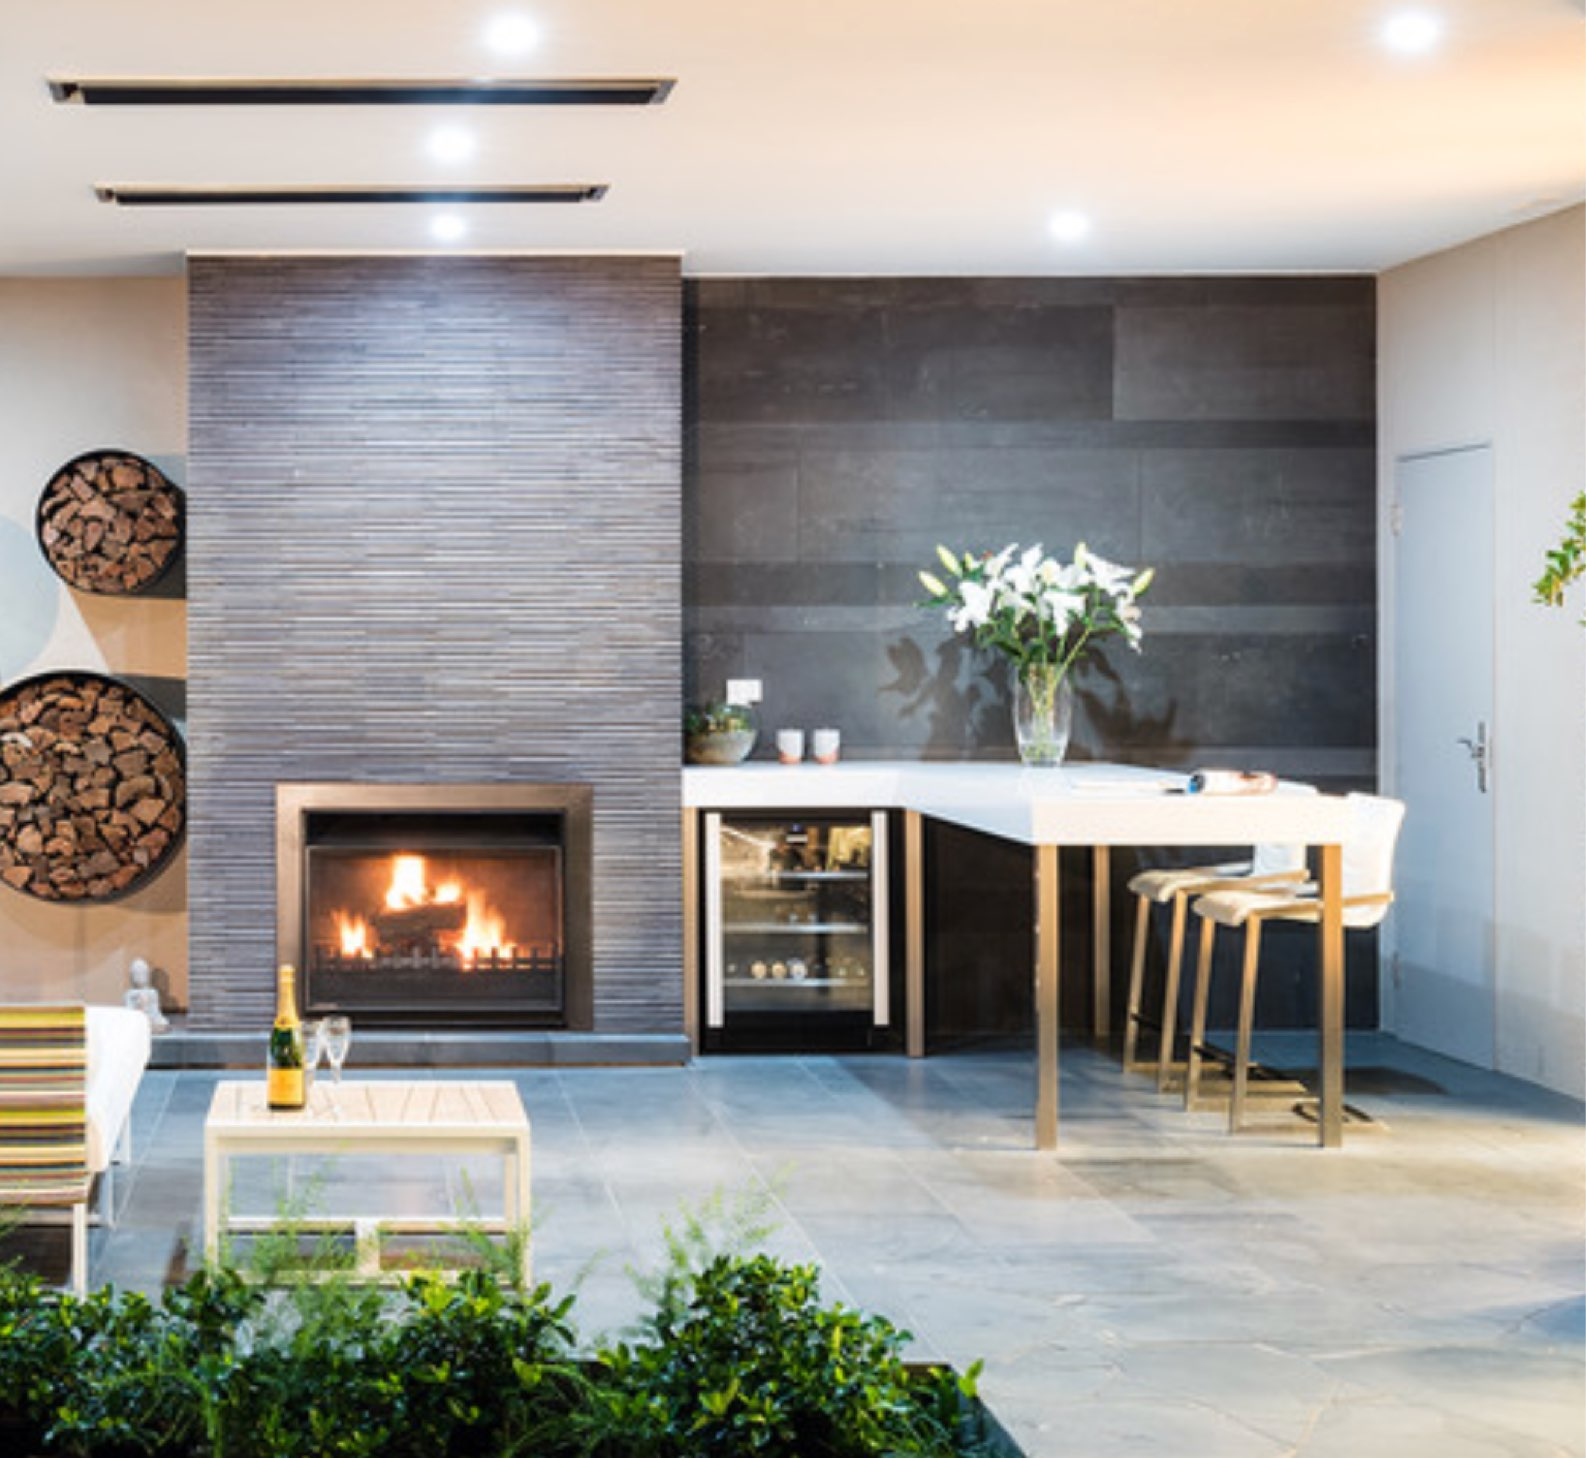 Luxury Outdoor Design Ideas & Remodel Photos | Houzz-1.jpg